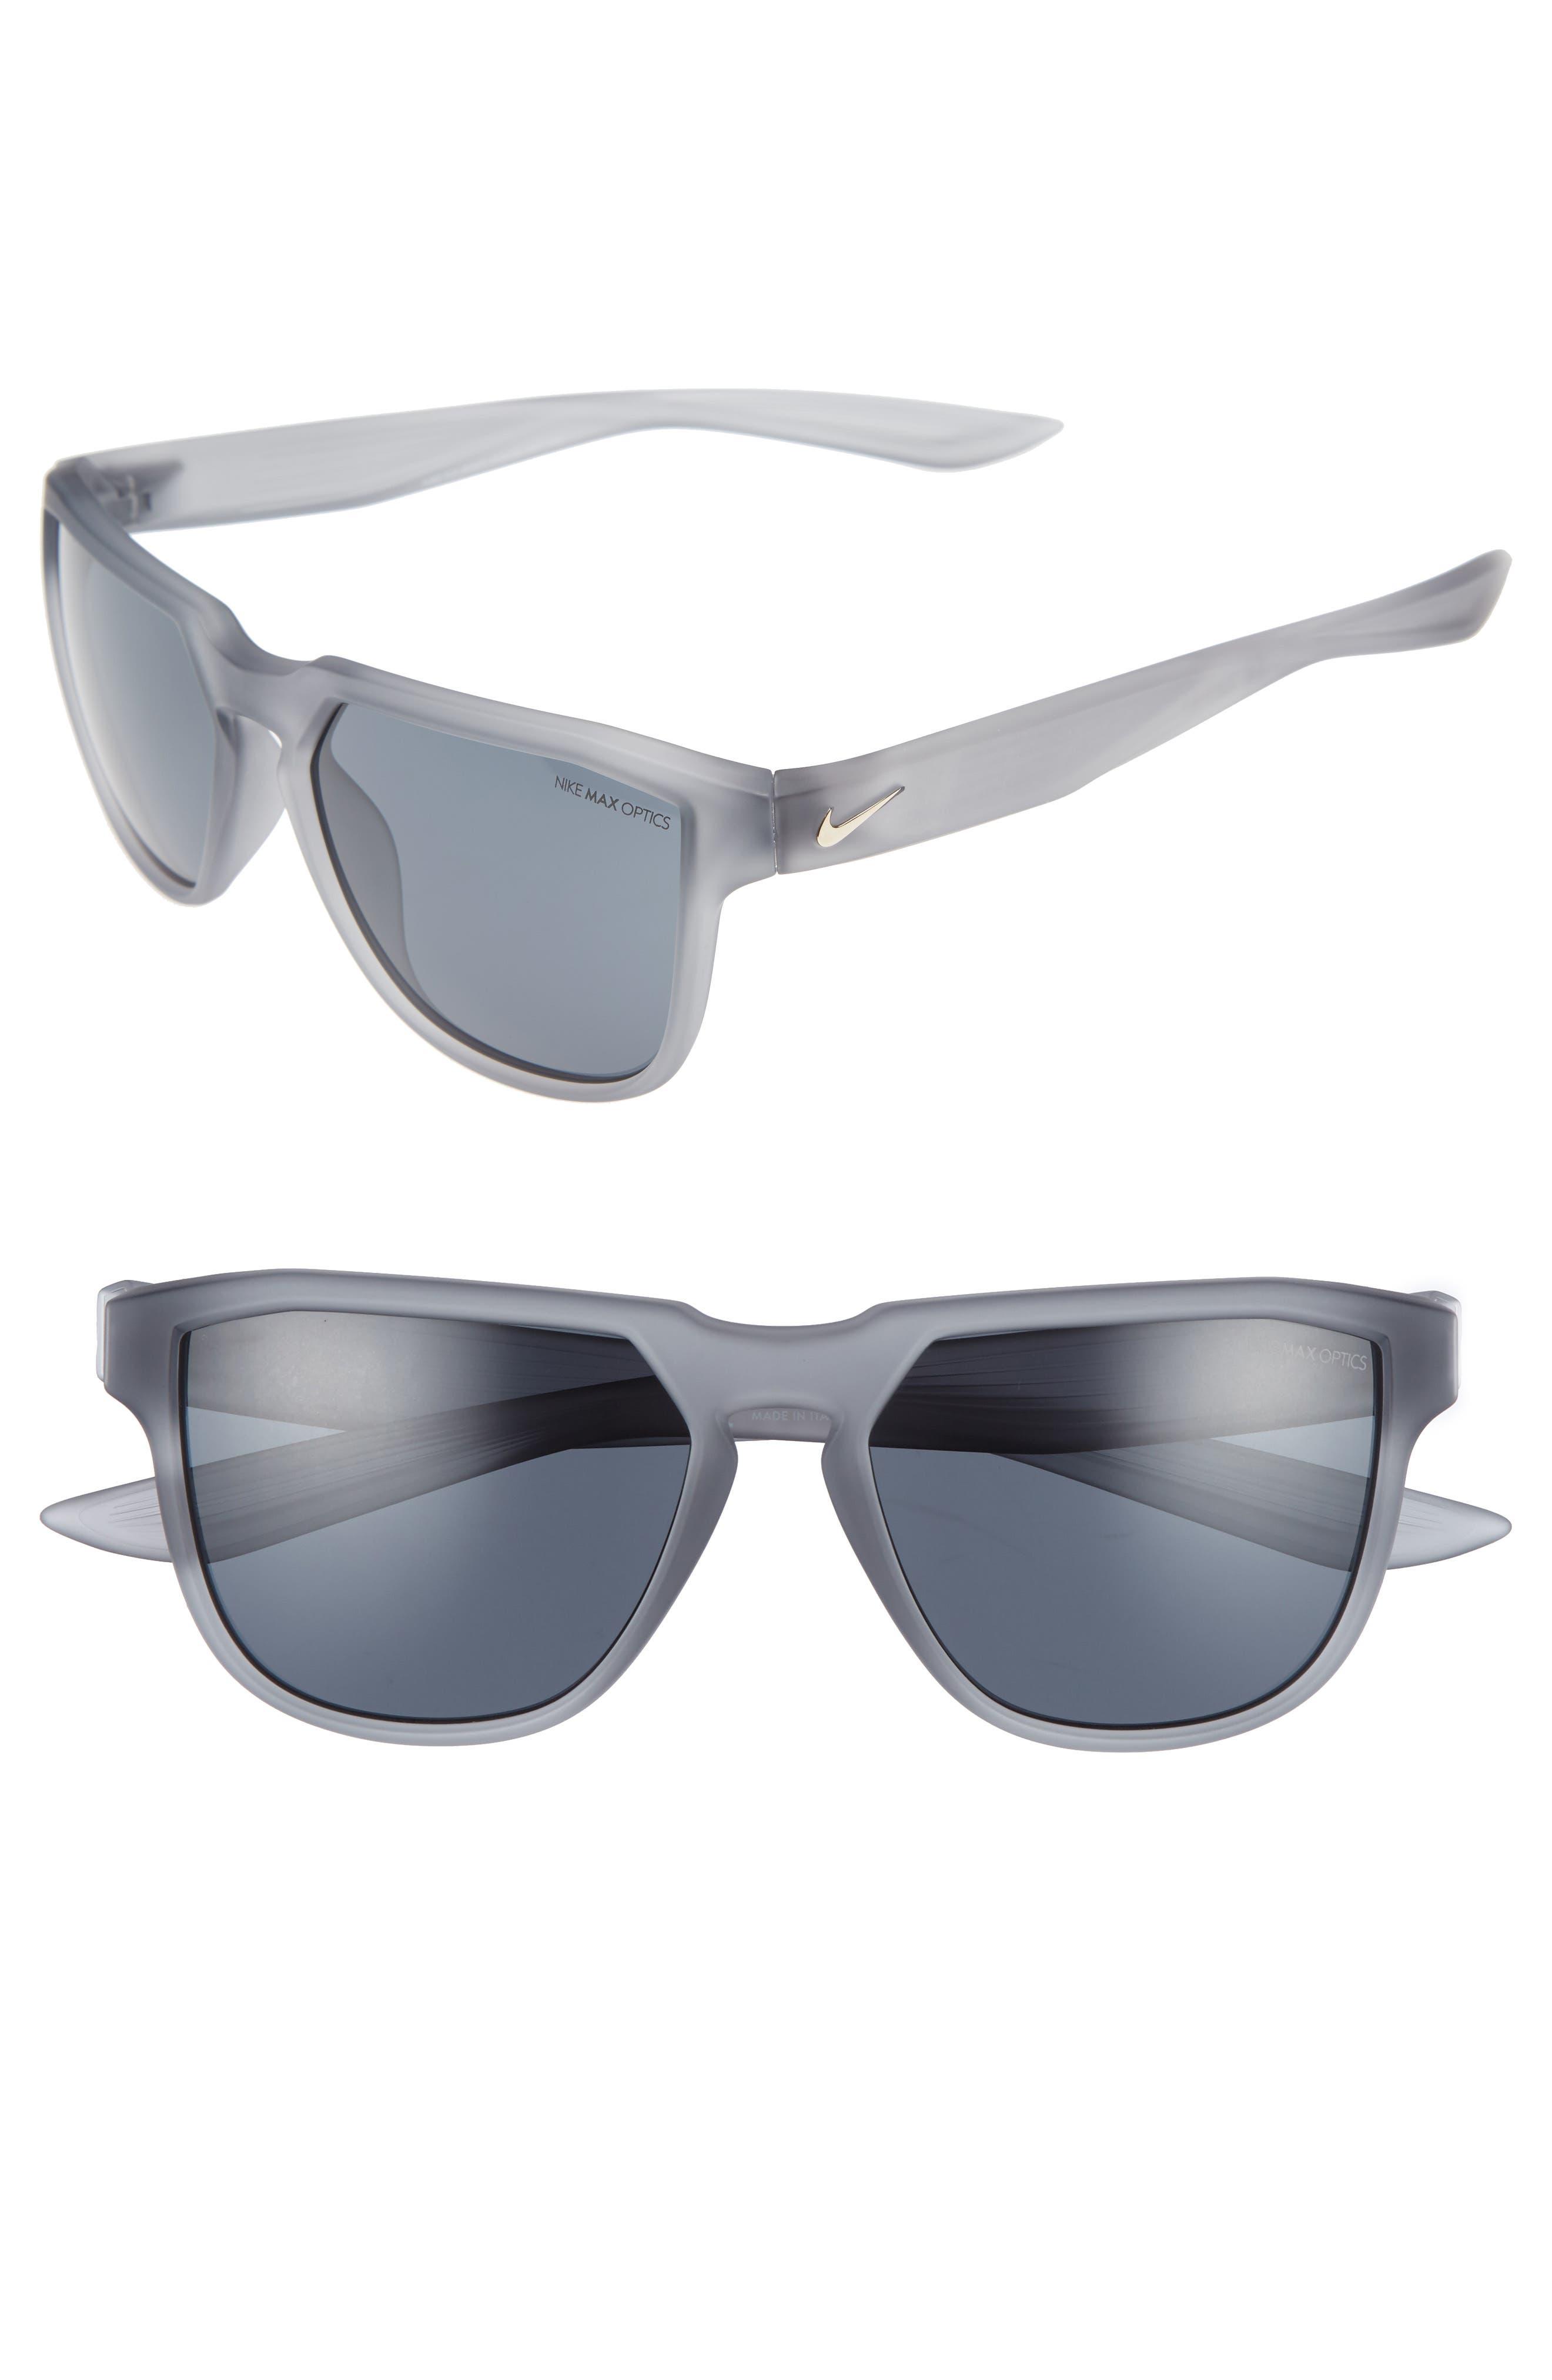 Main Image - Nike Fly Swift 57mm Sunglasses